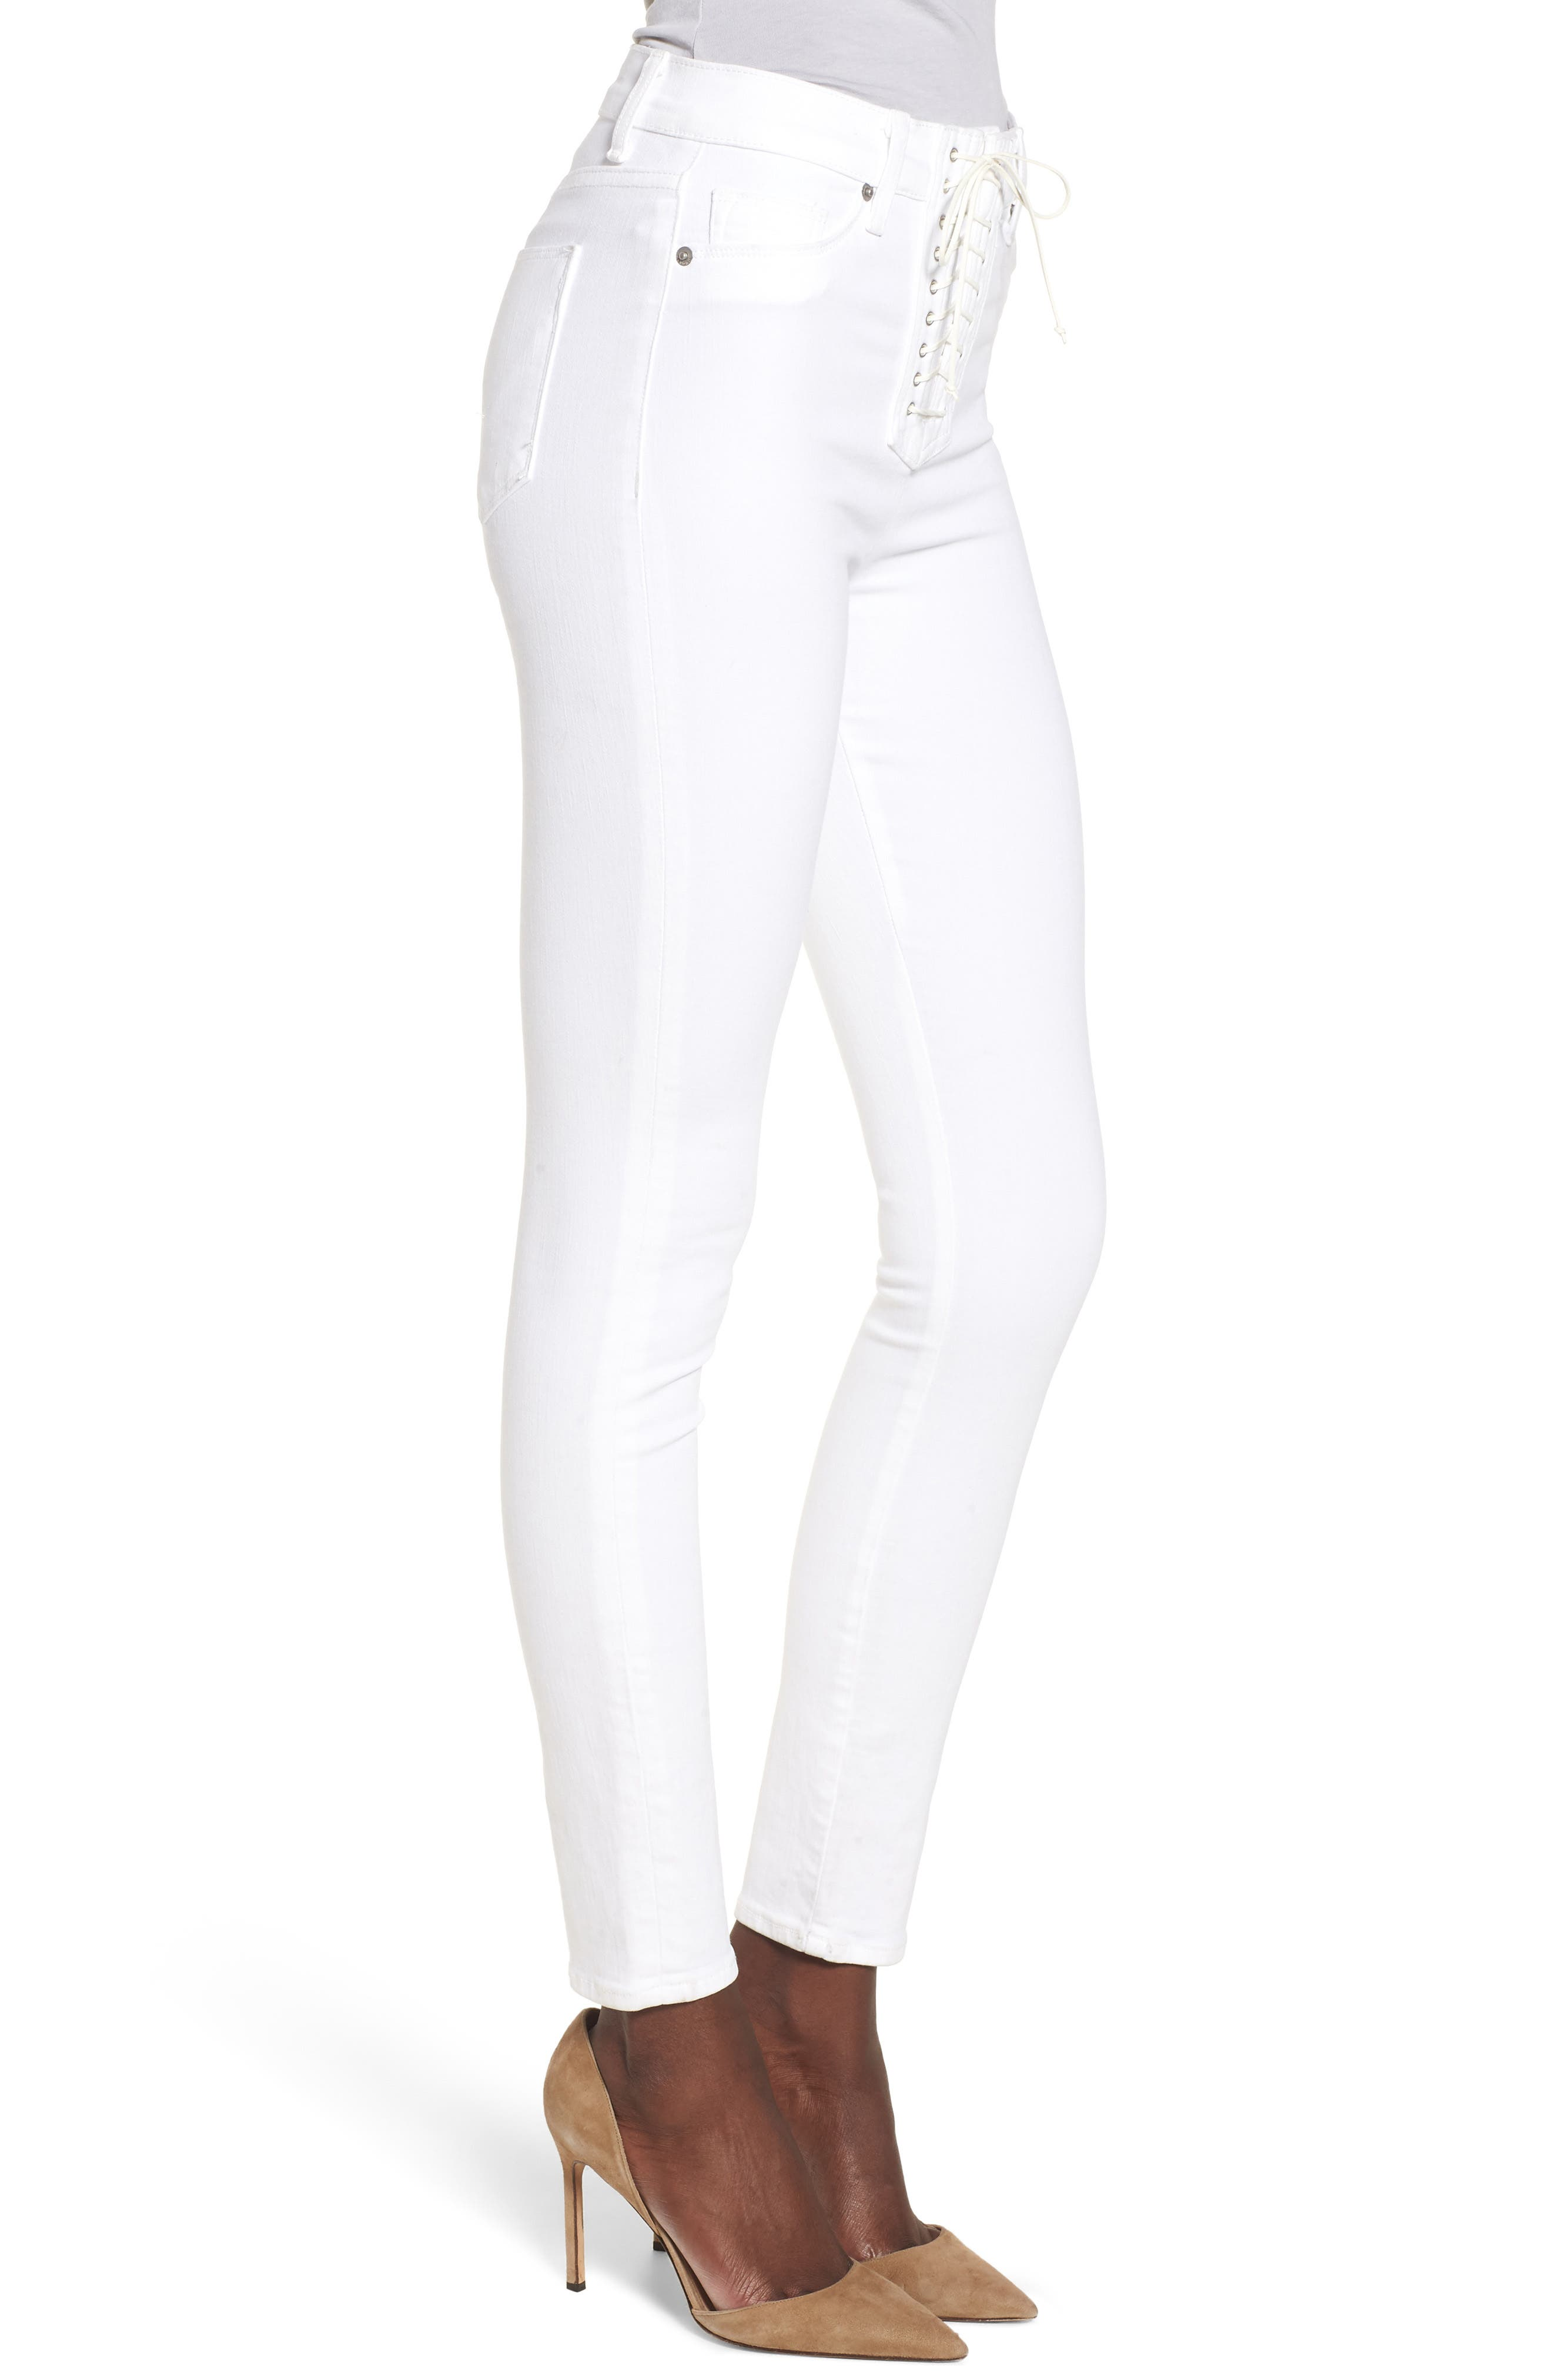 HUDSON JEANS,                             Bullocks Lace-Up High Waist Super Skinny Jeans,                             Alternate thumbnail 3, color,                             110